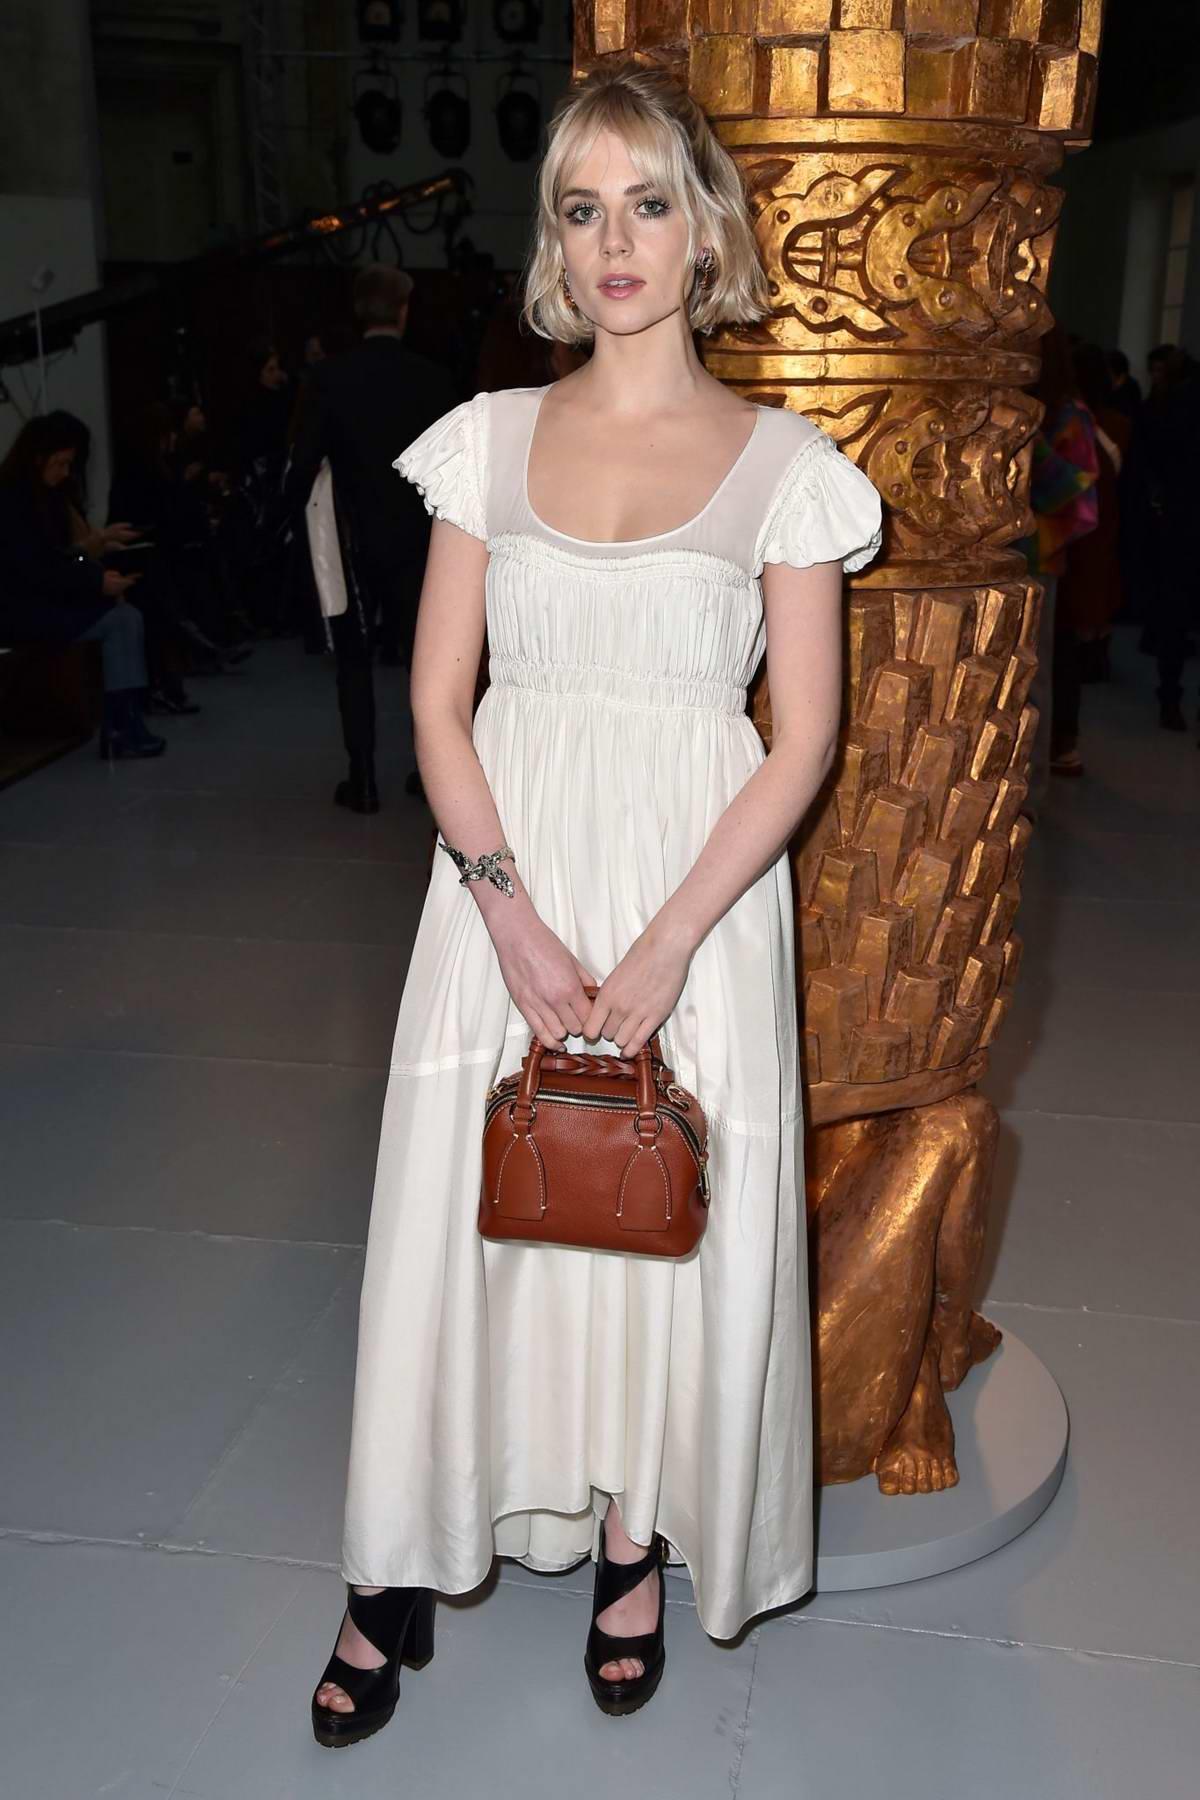 Lucy Boynton attends the Chloe show, F/W 2020 during Paris Fashion Week in Paris, France